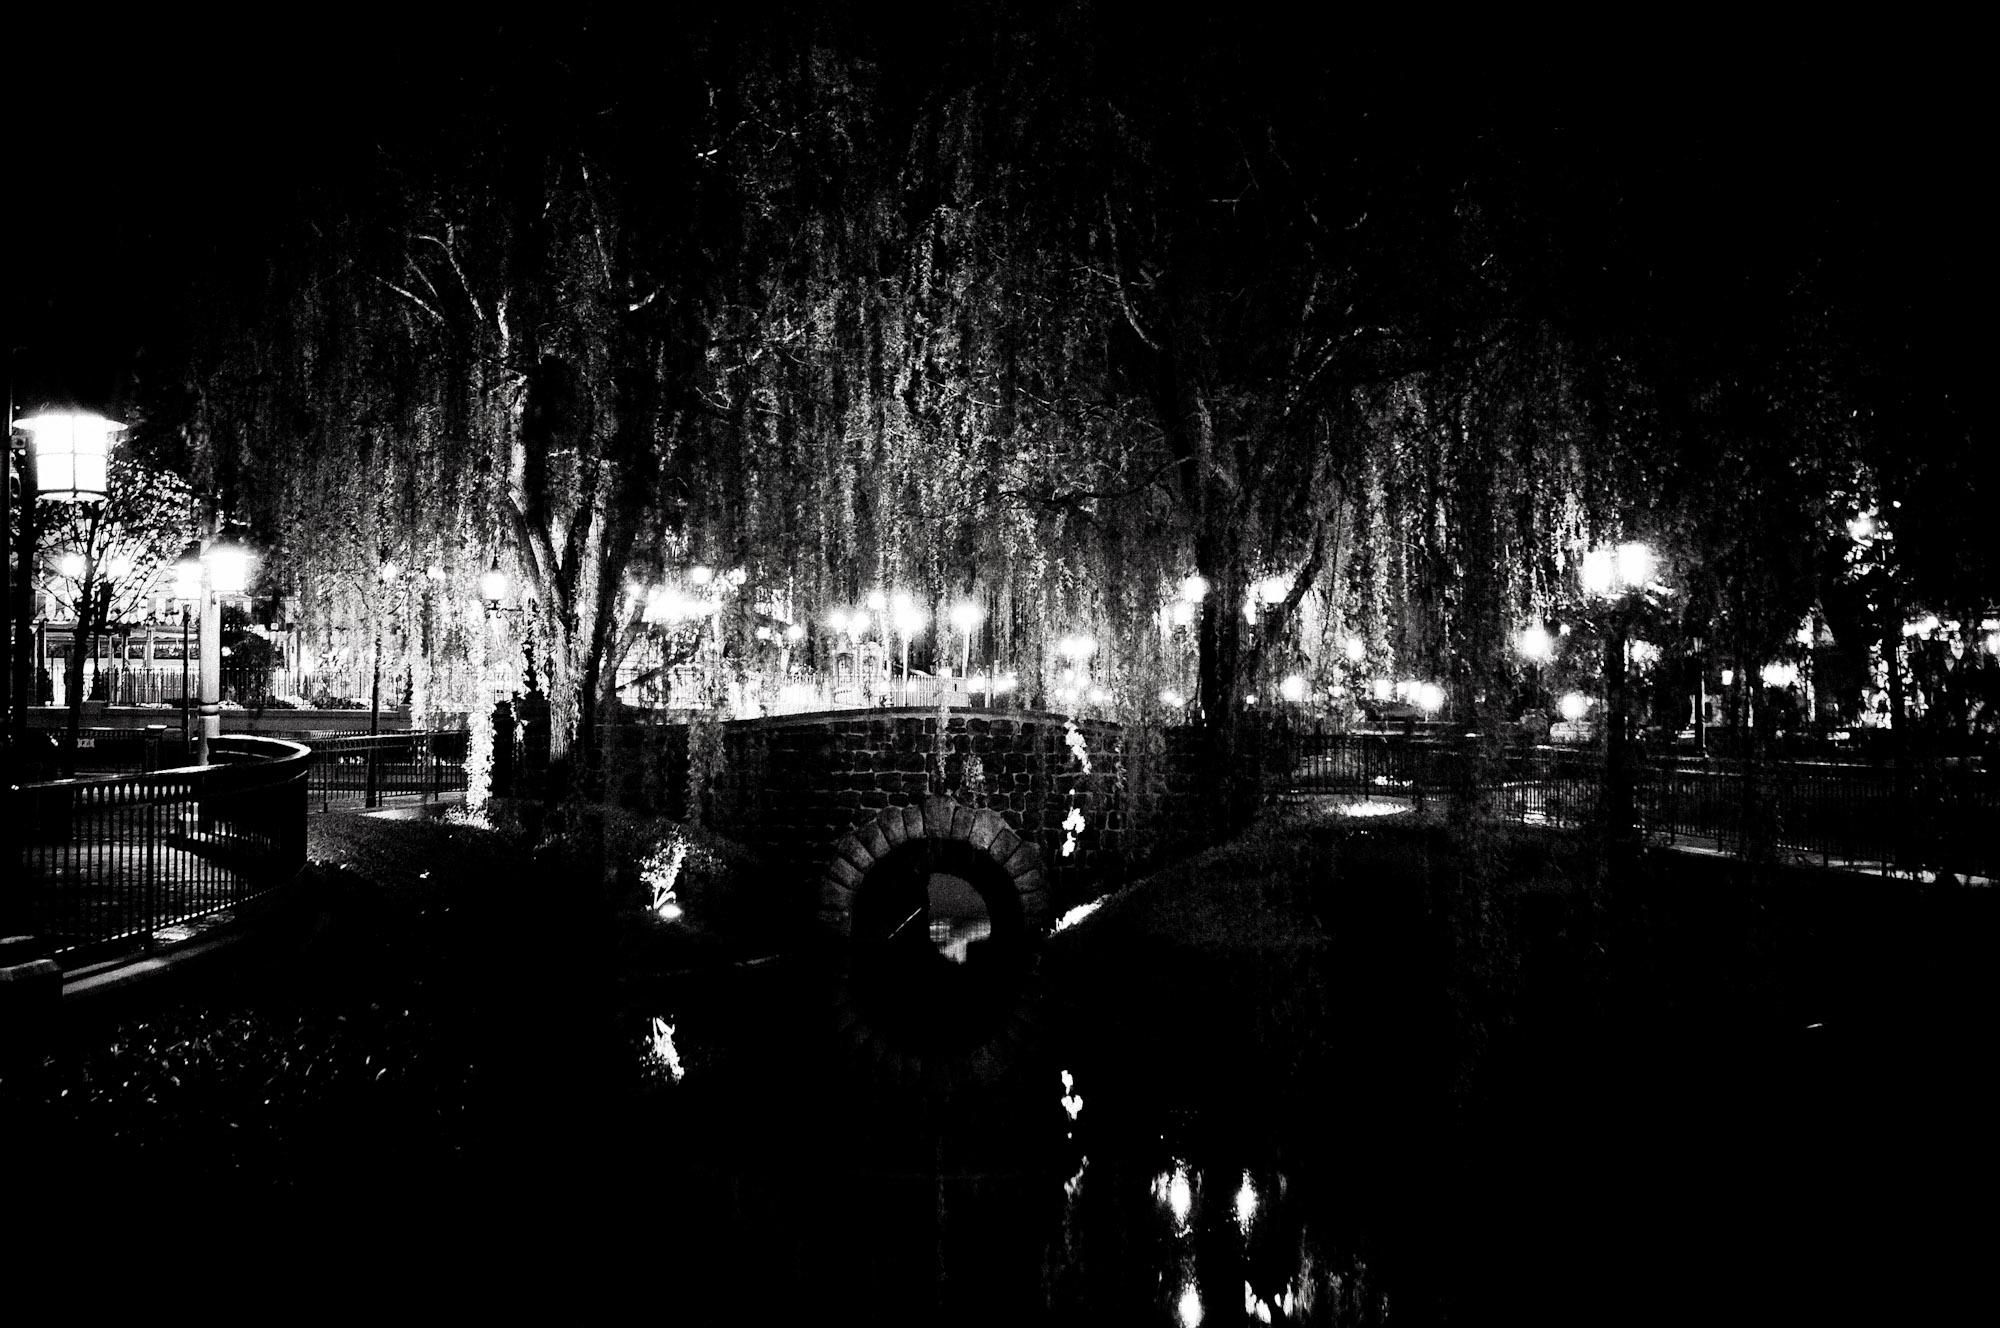 disneyland-paris-black-white-5